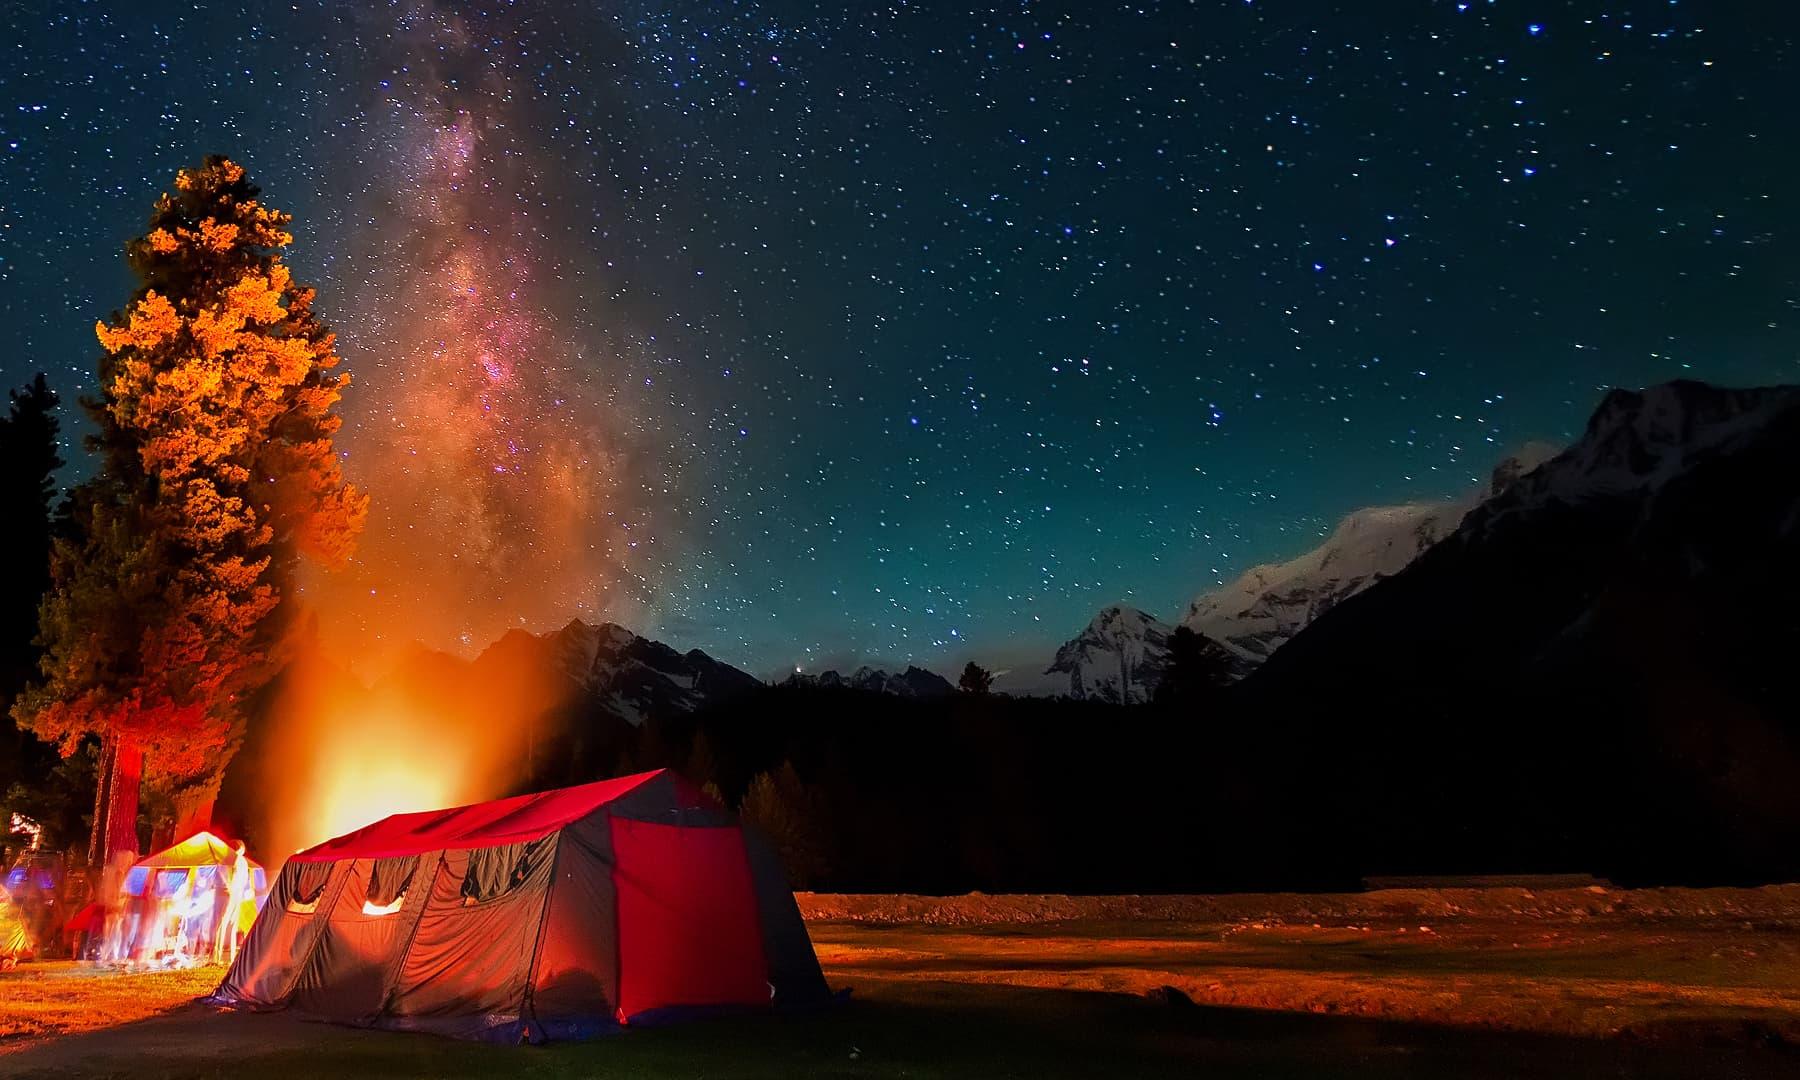 Night in Rama Meadows. — Syed Mehdi Bukhari